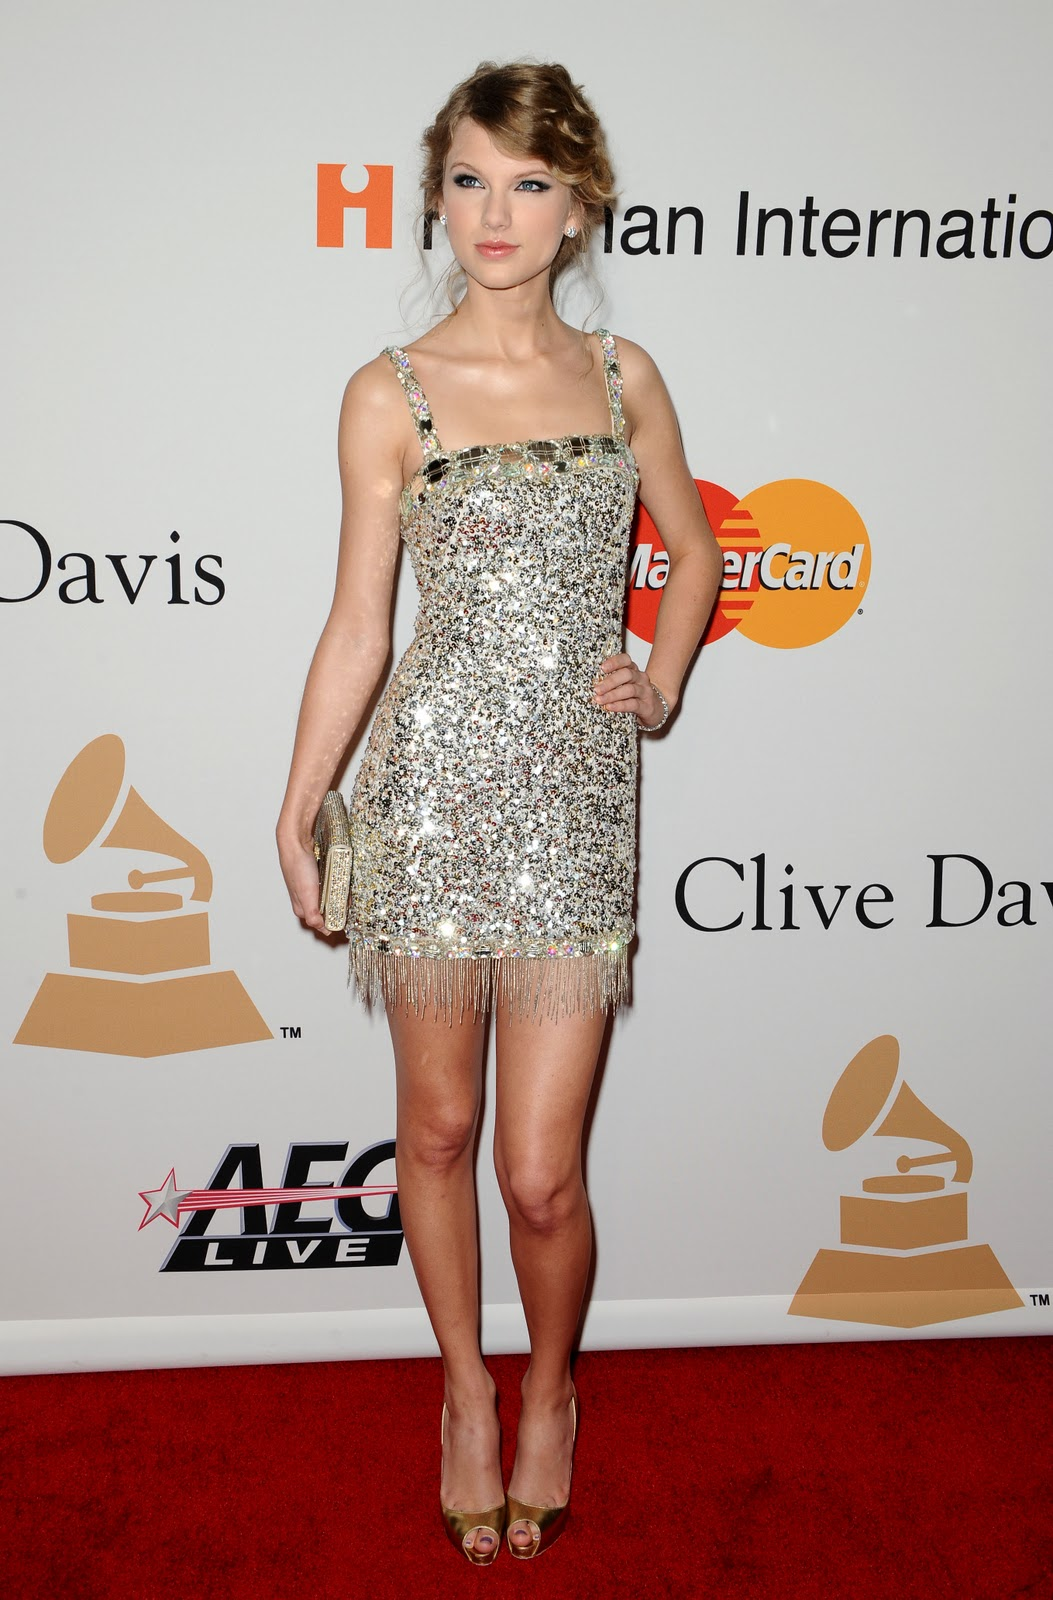 http://4.bp.blogspot.com/-7EY1ycAyYTA/UOSHBSgLwHI/AAAAAAAAAXQ/QJ2SYx9JjPk/s1600/Taylor+Swift+feet7.jpg